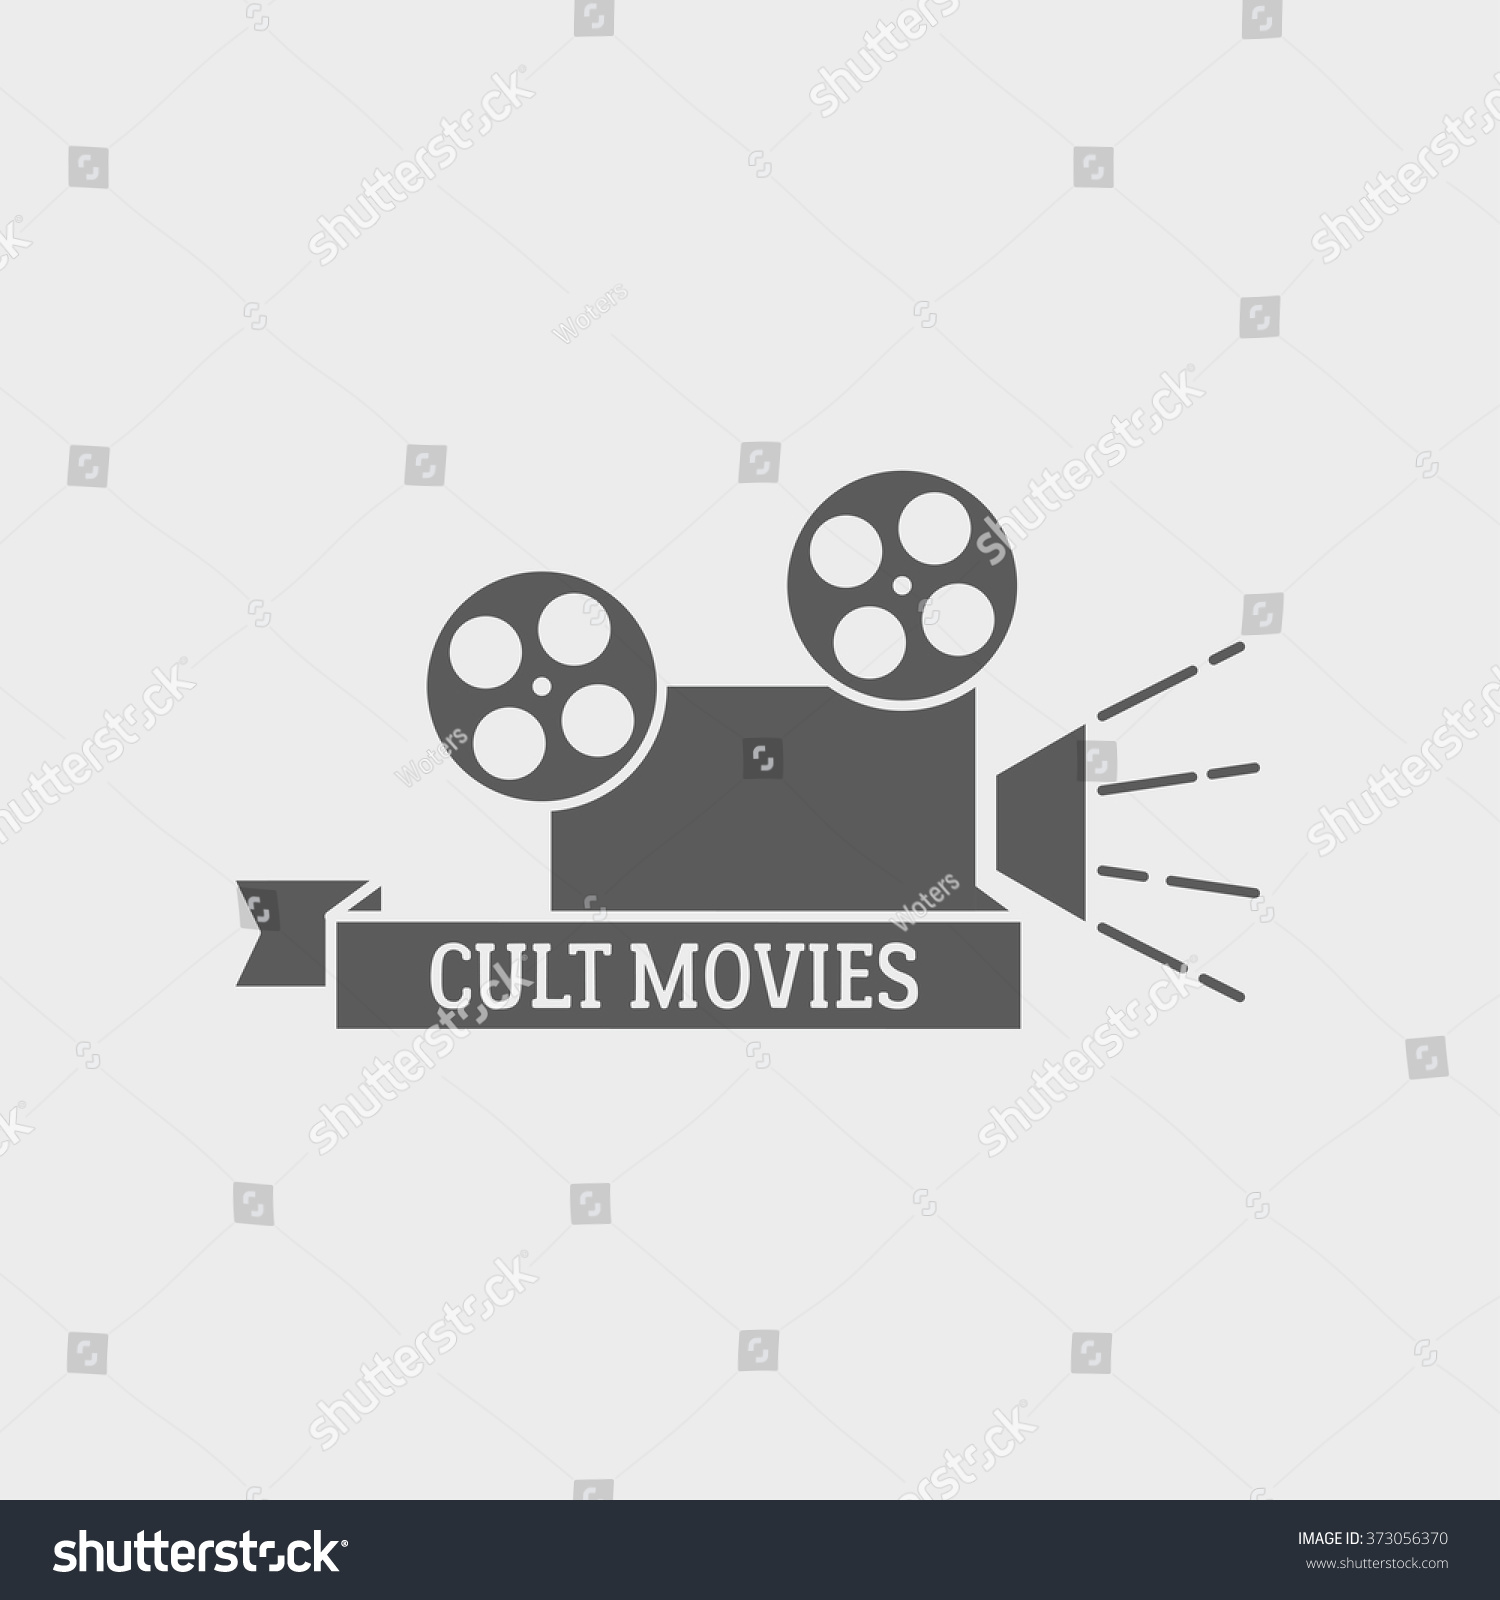 Movie theater vector logo badge label stock vector for Camera film logo